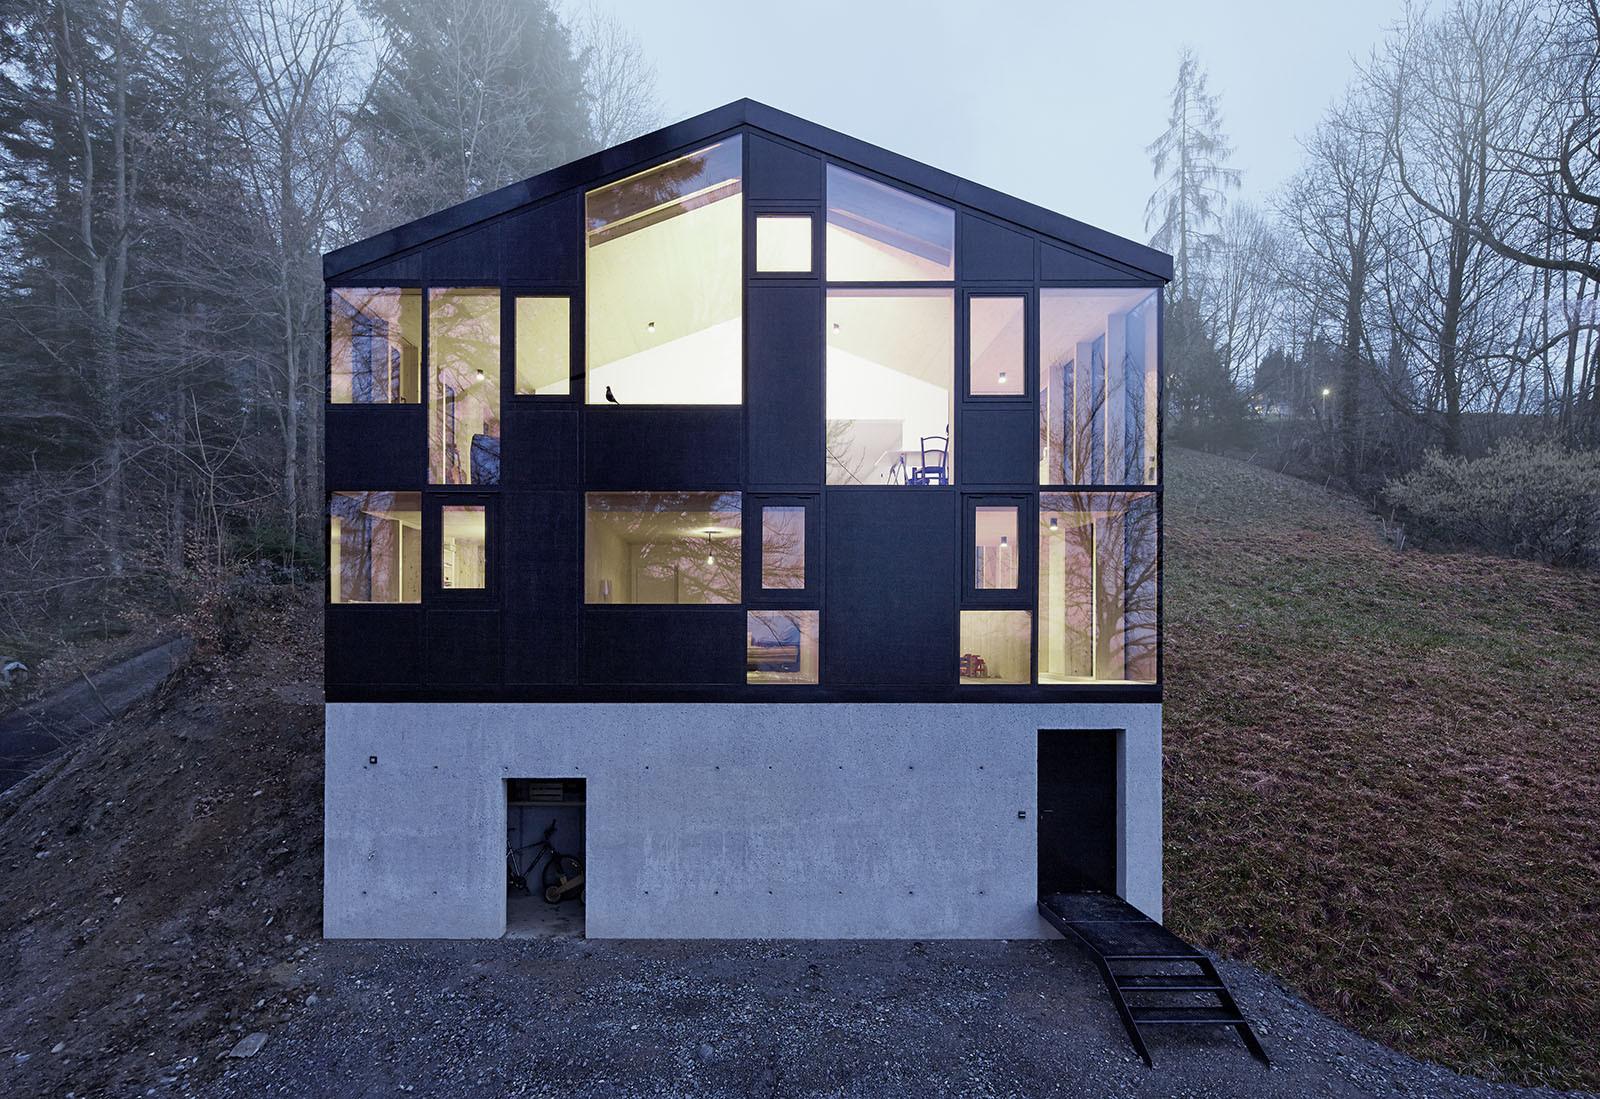 Haus Hohlen / Jochen Specht, © Adolf Bereuter